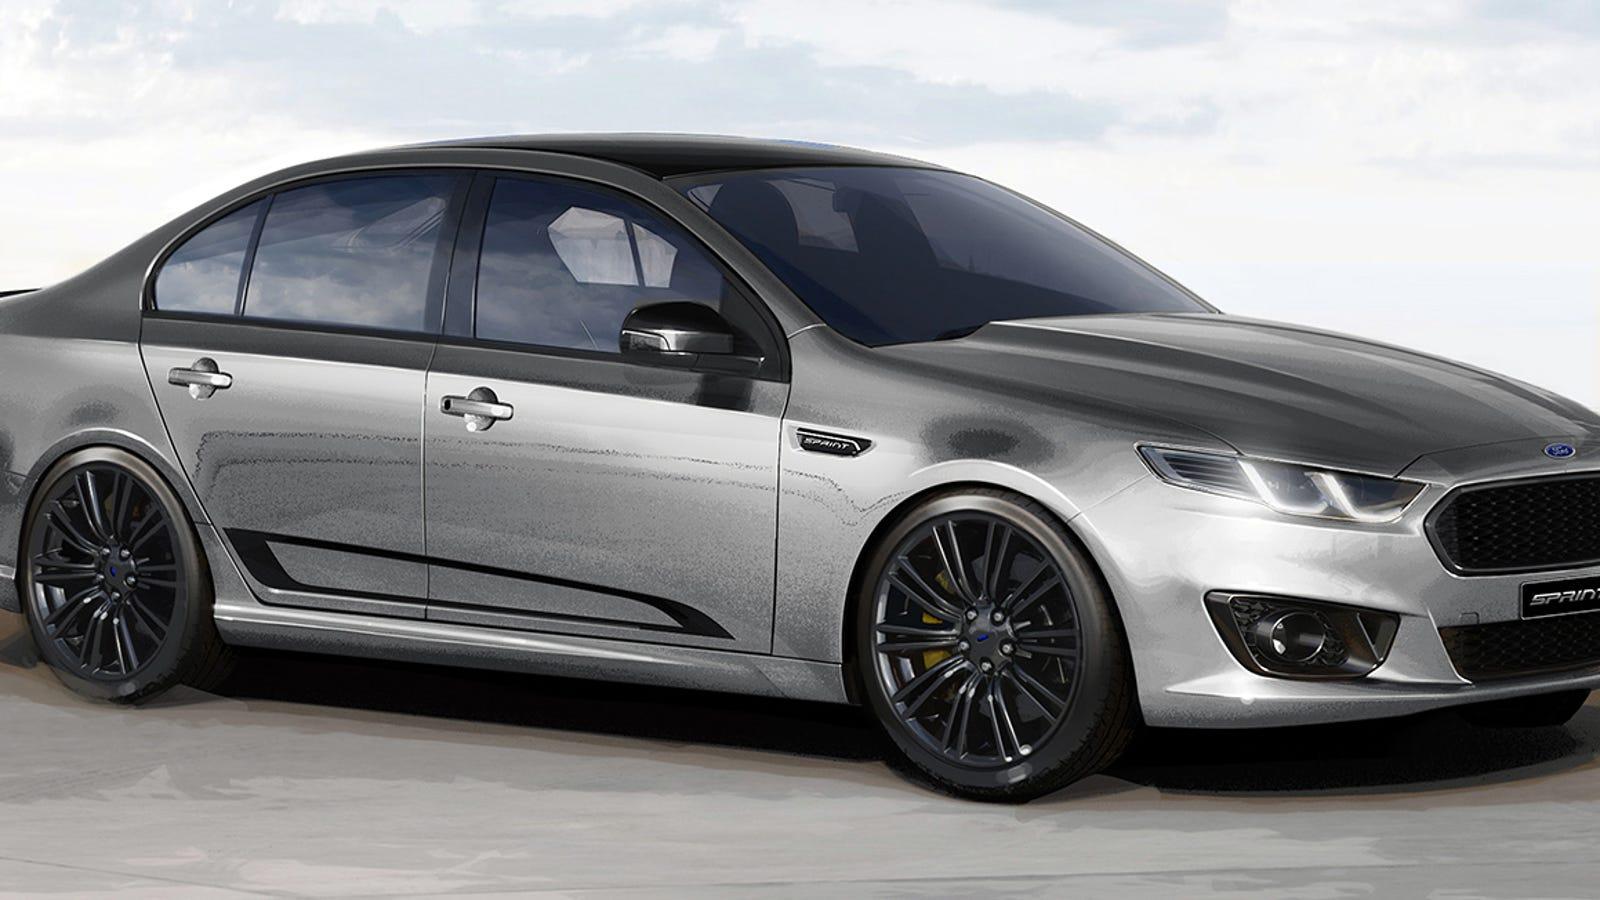 The 462 horsepower ford falcon xr8 sprint is a loud farewell to australian car production